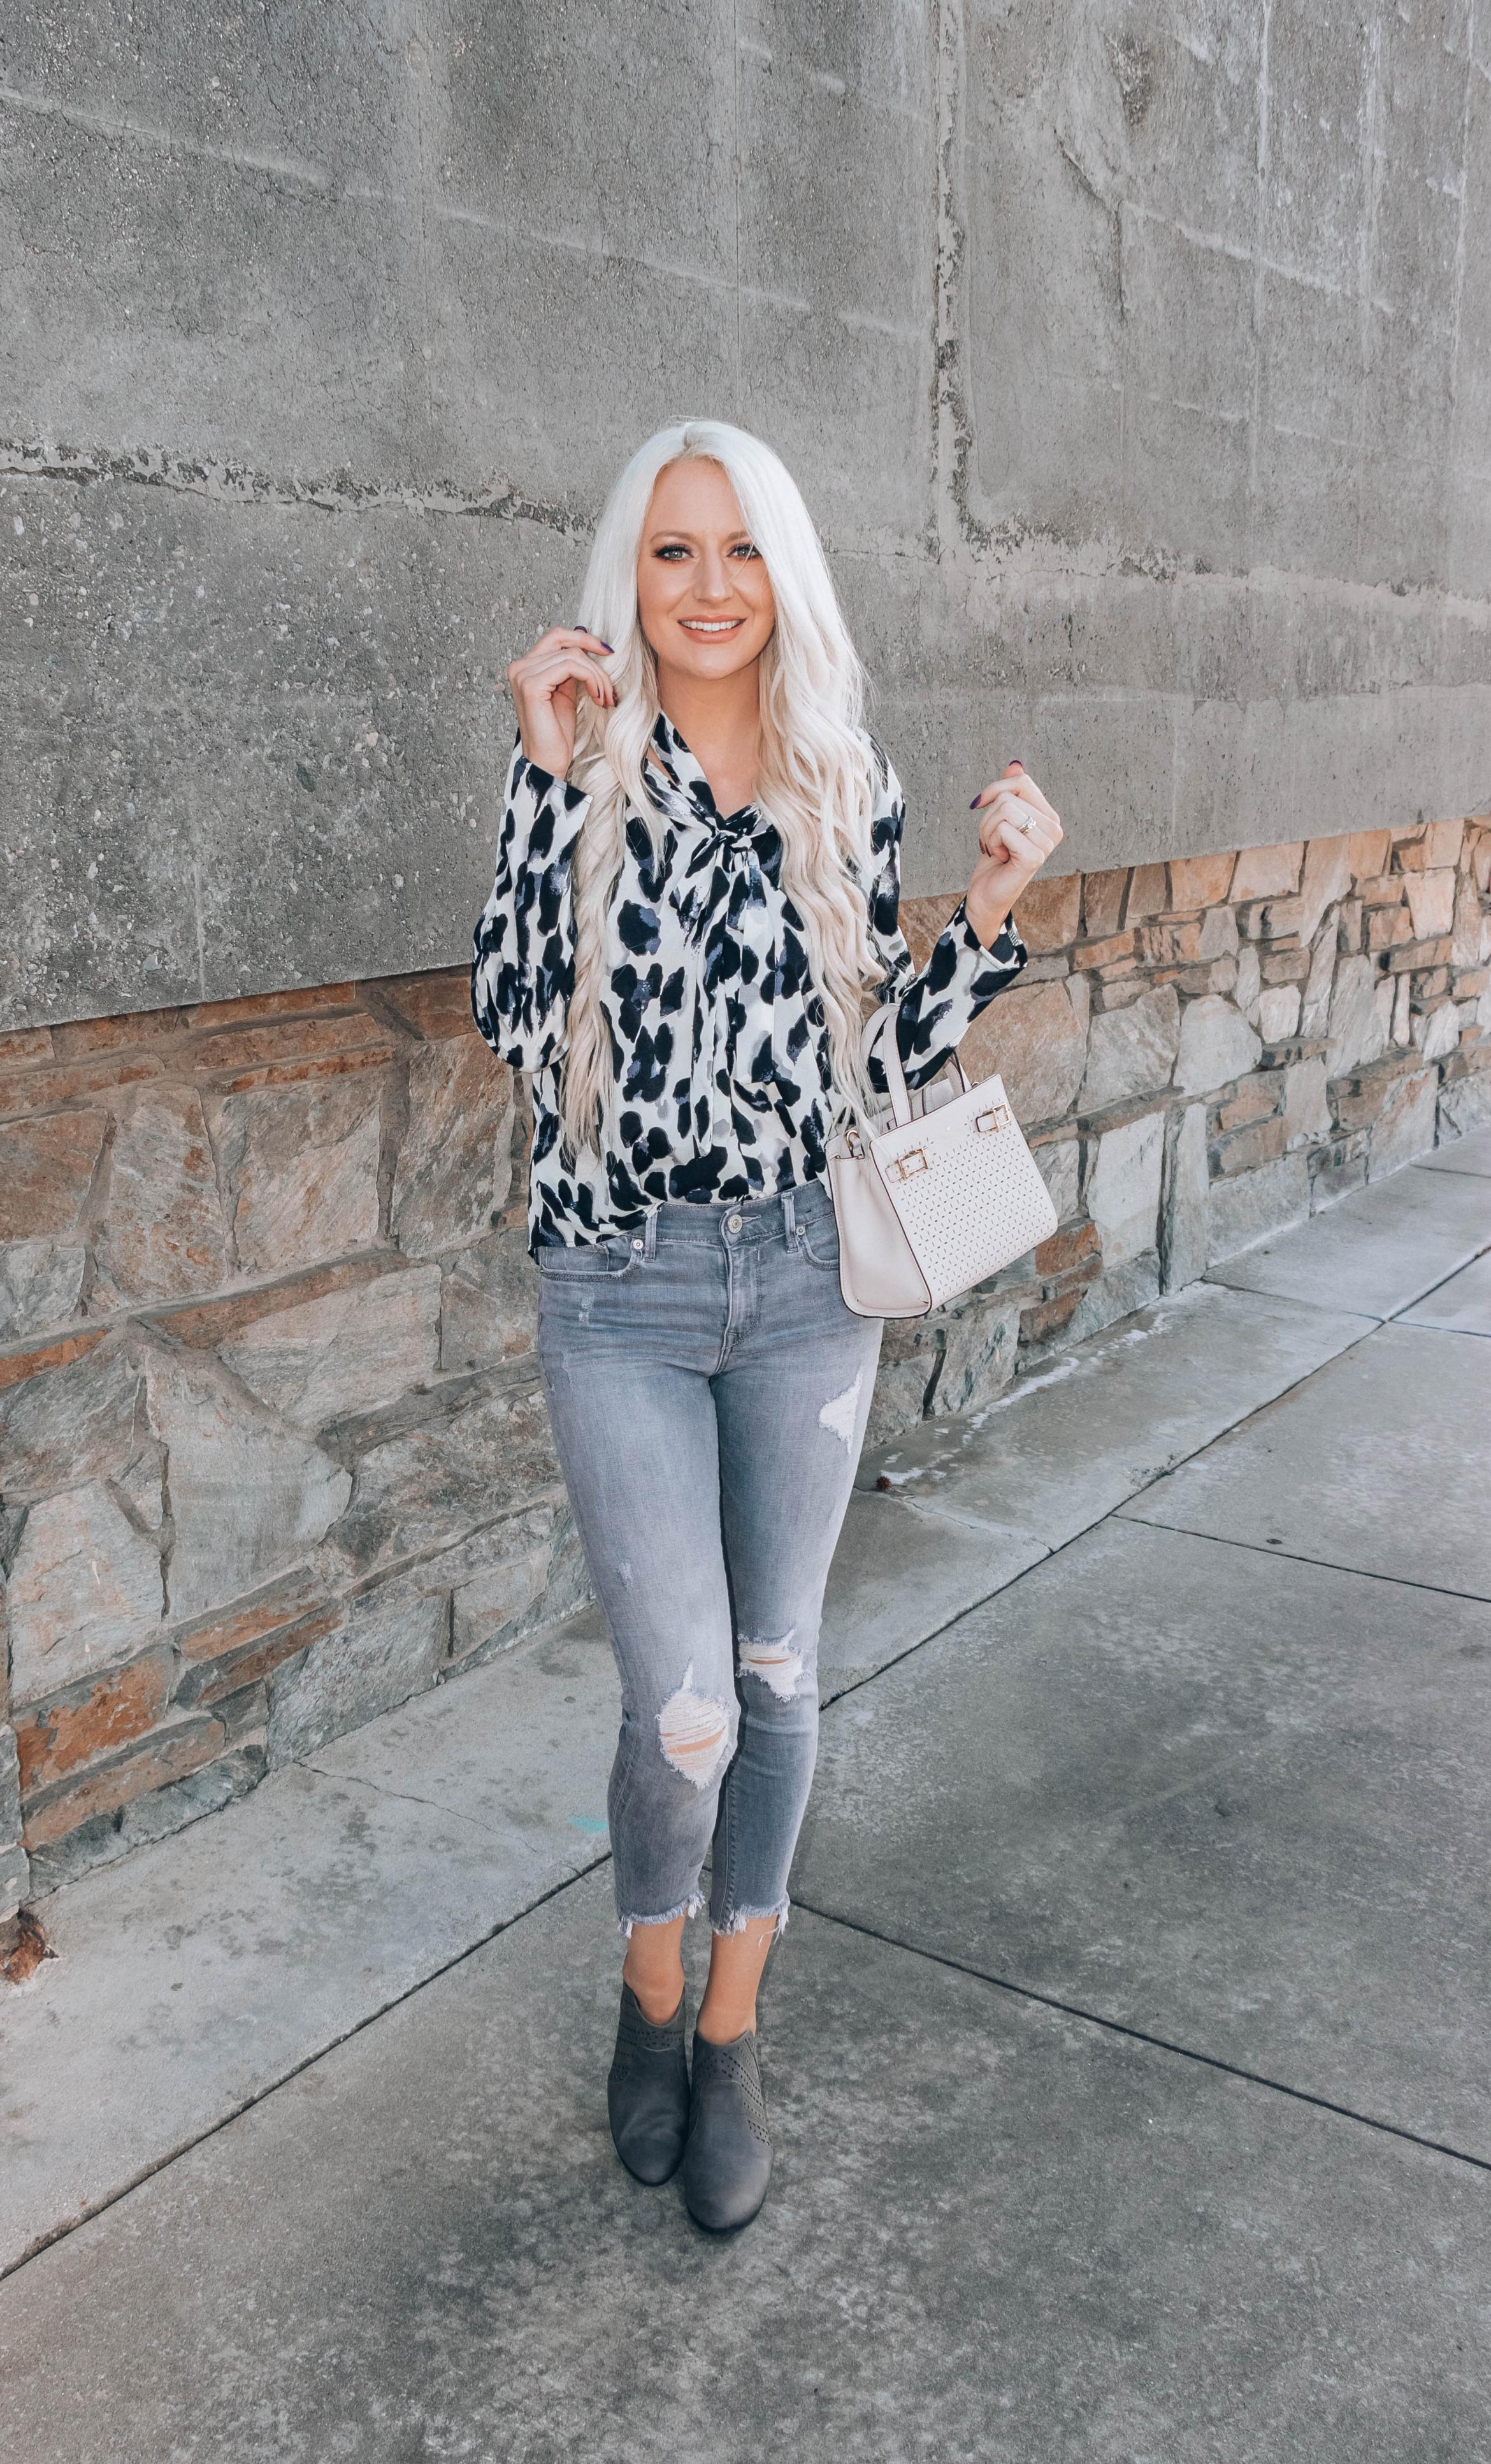 dadb1e4929f 3 Ways To Wear Leopard Print   Must Heart Style Fashion Blog ...